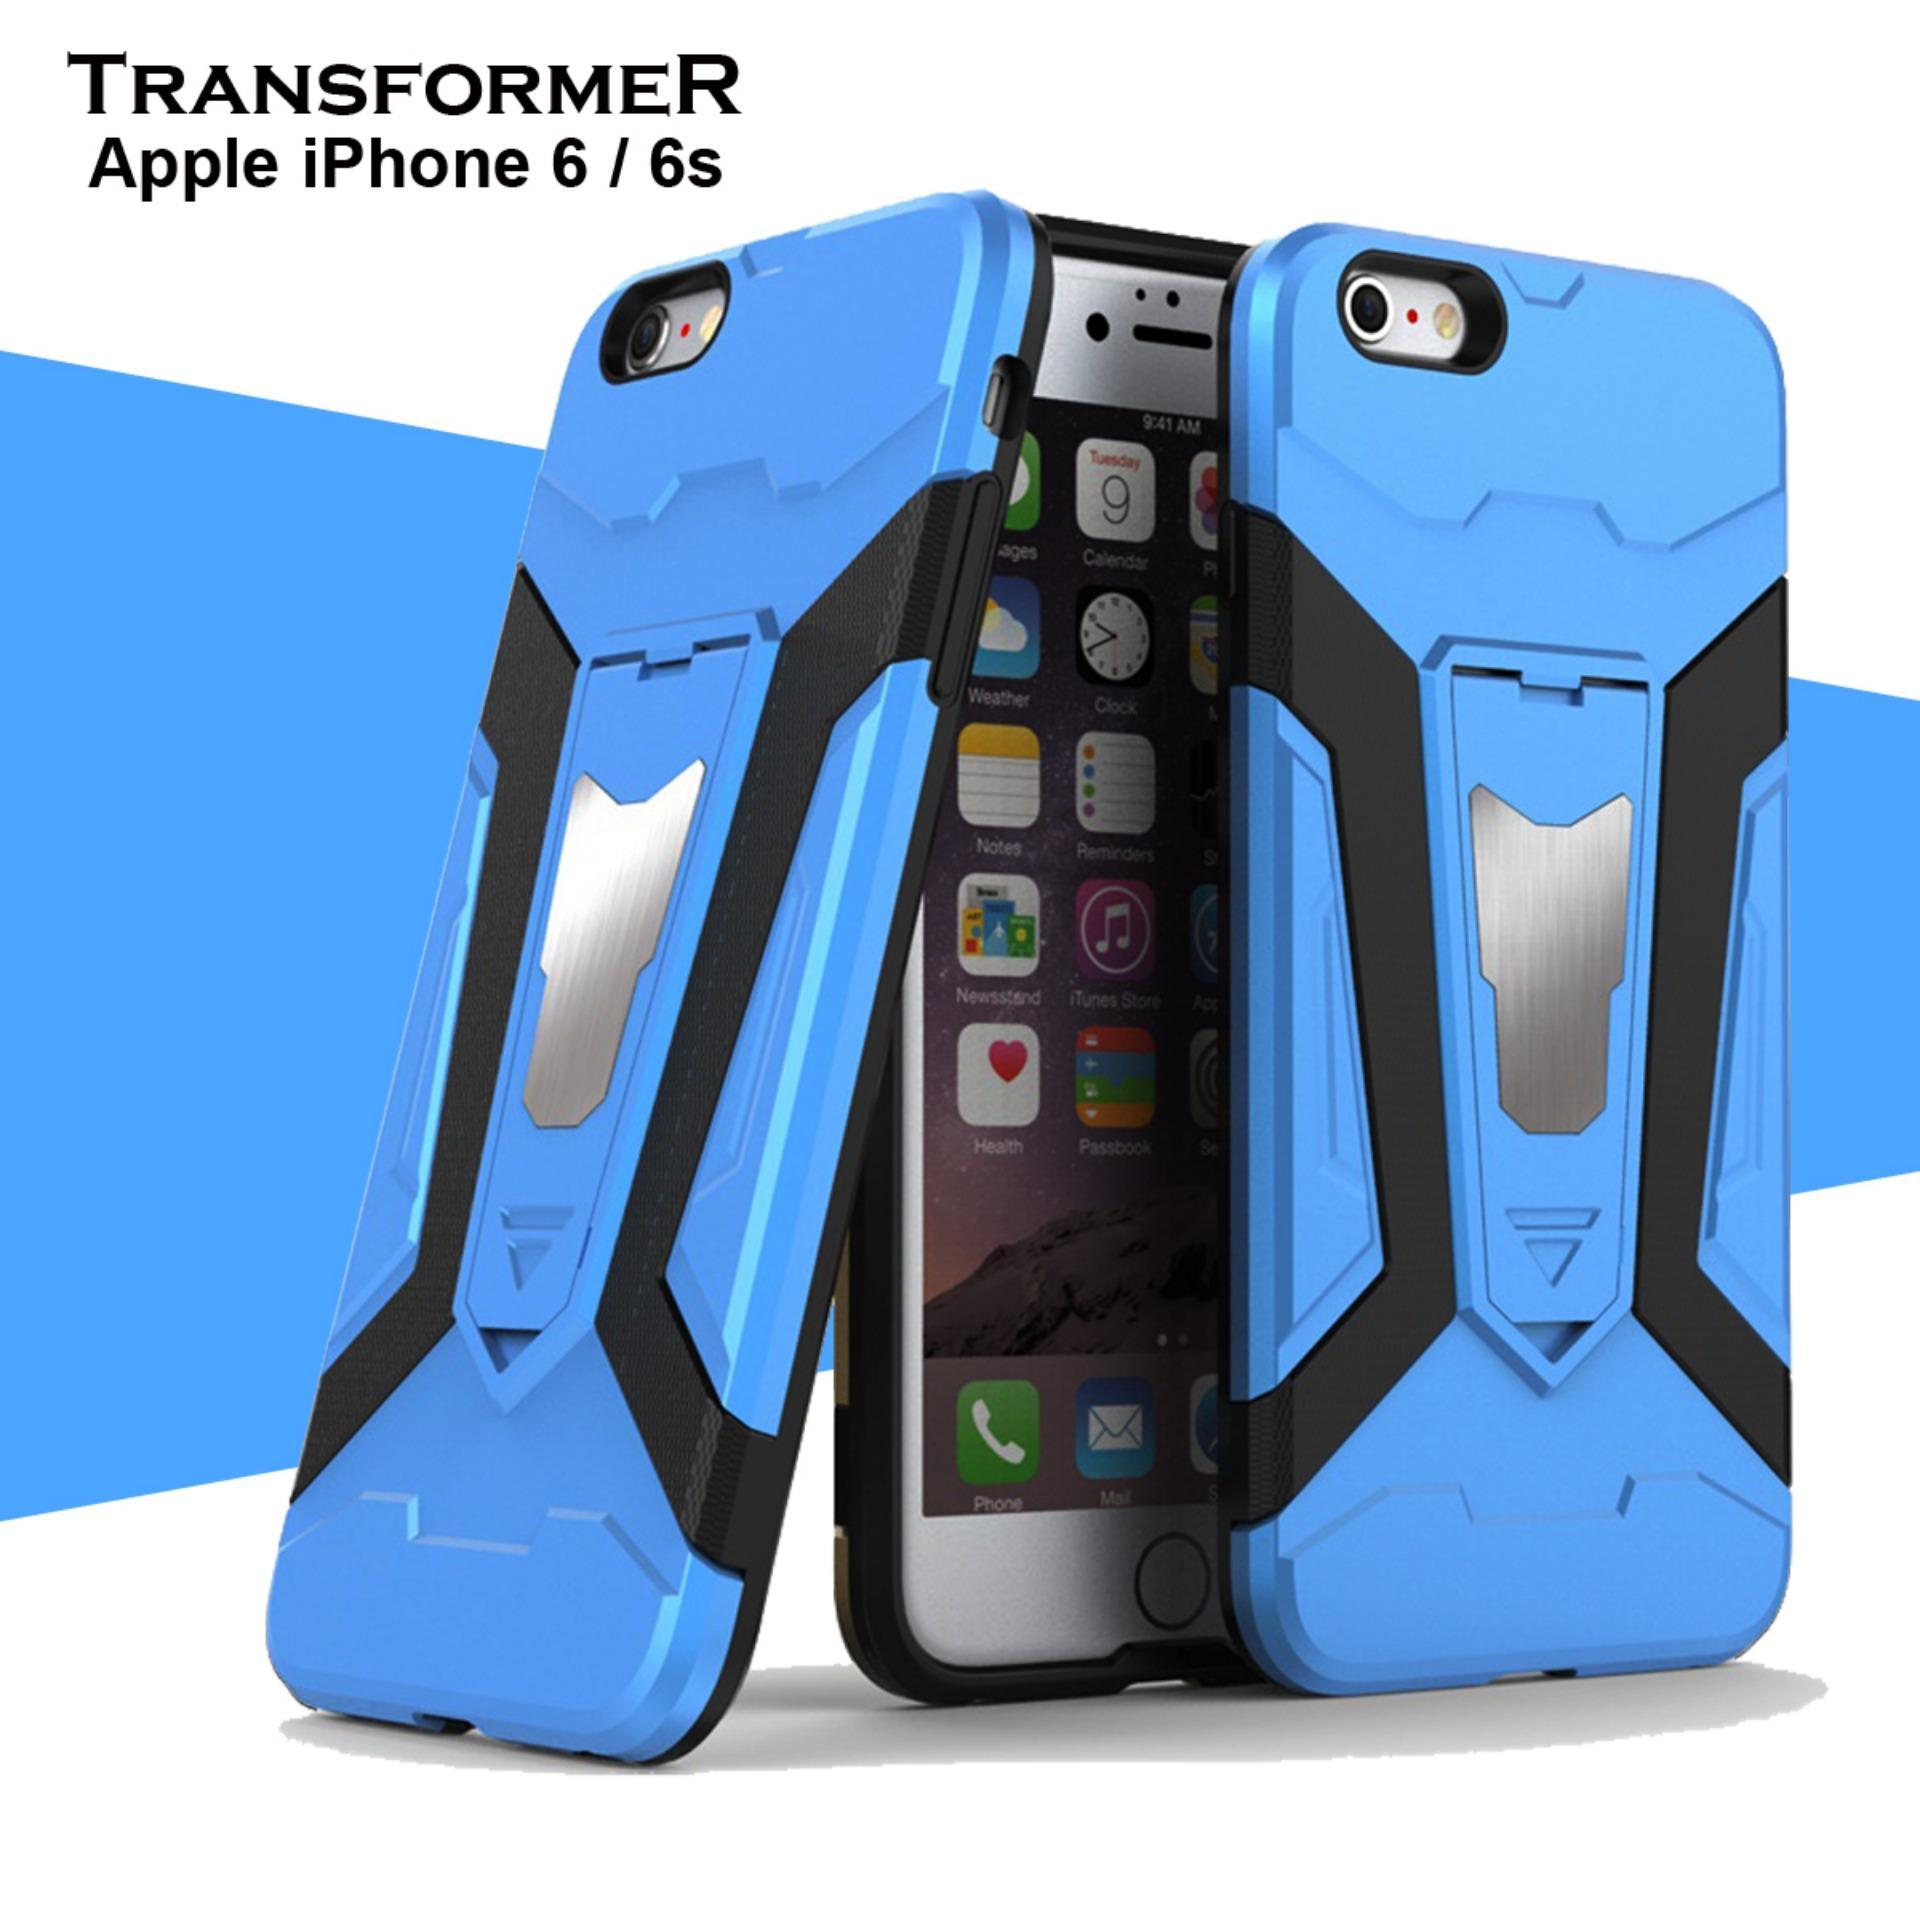 ProCase Transformer Kickstand Slim Armor Hardcase for Iphone 6 / 6s - Biru